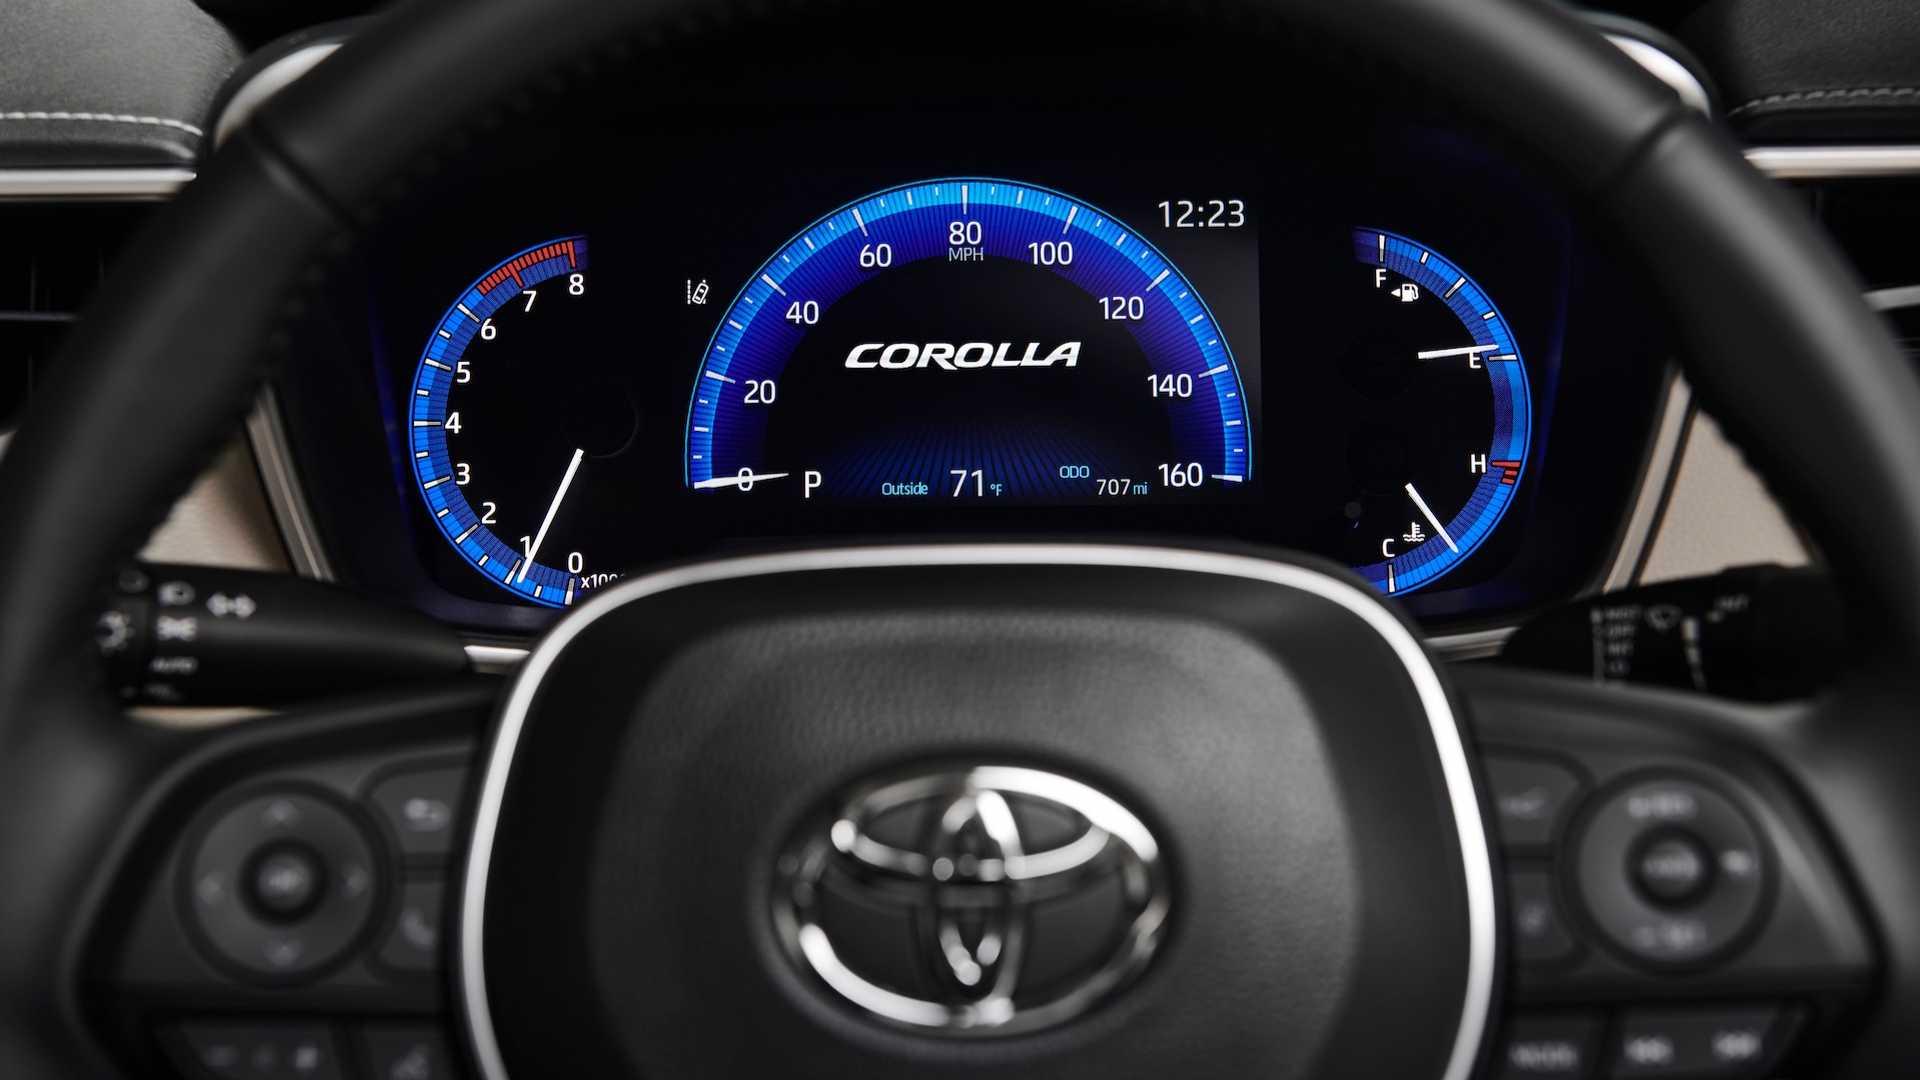 First Look: 2019 Toyota Corolla Sedan - ForceGT.com